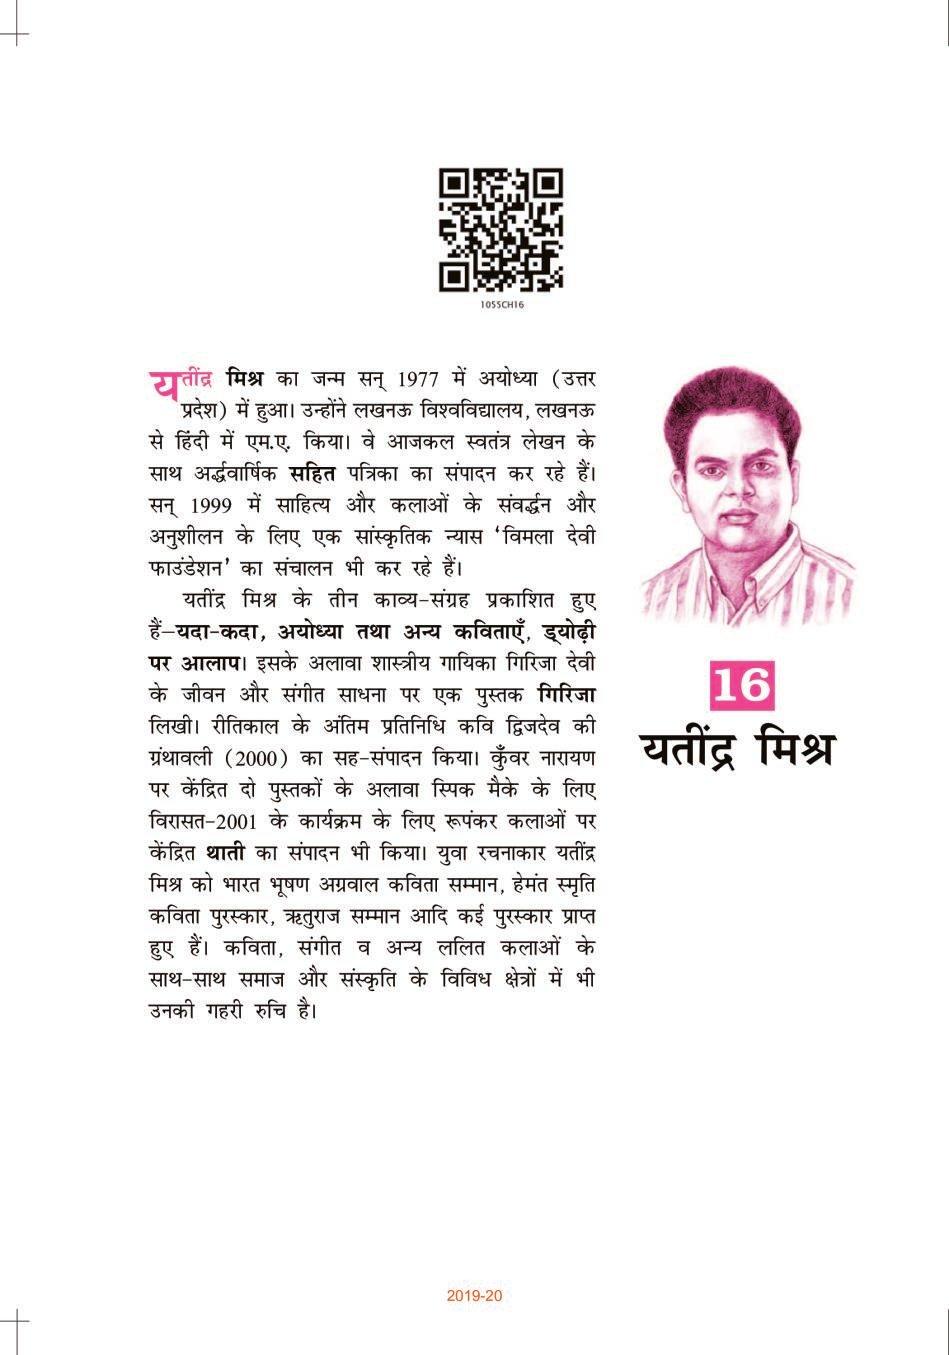 NCERT Book Class 10 Hindi (क्षितिज) Chapter 16 नौबतखाने में इबादत - Page 1